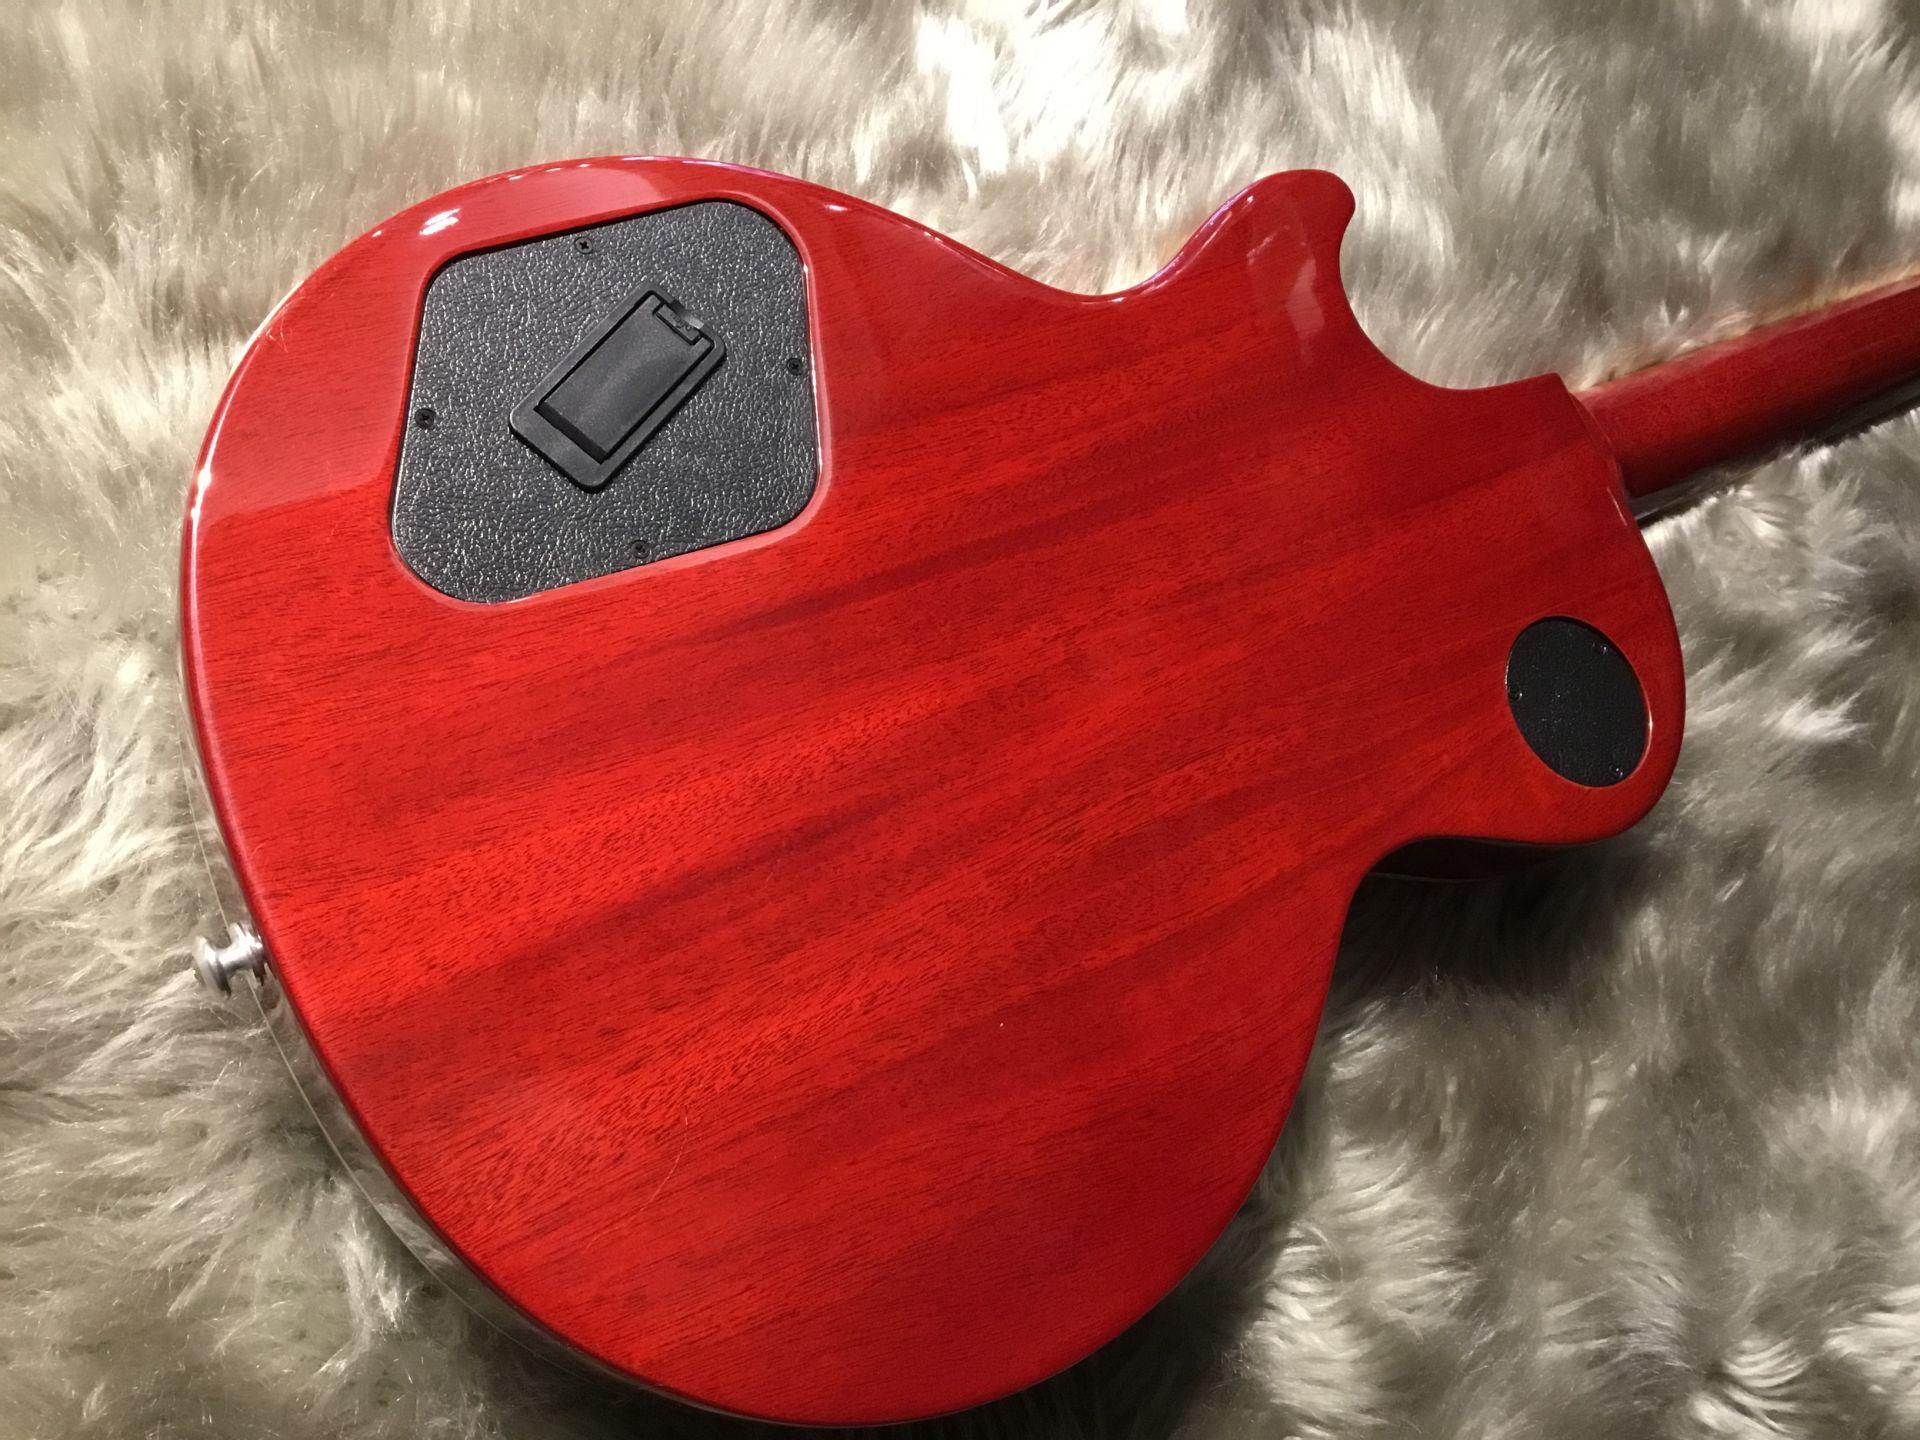 LP Traditional PLUS(Heritage Cherry Sunburst)のボディバック-アップ画像